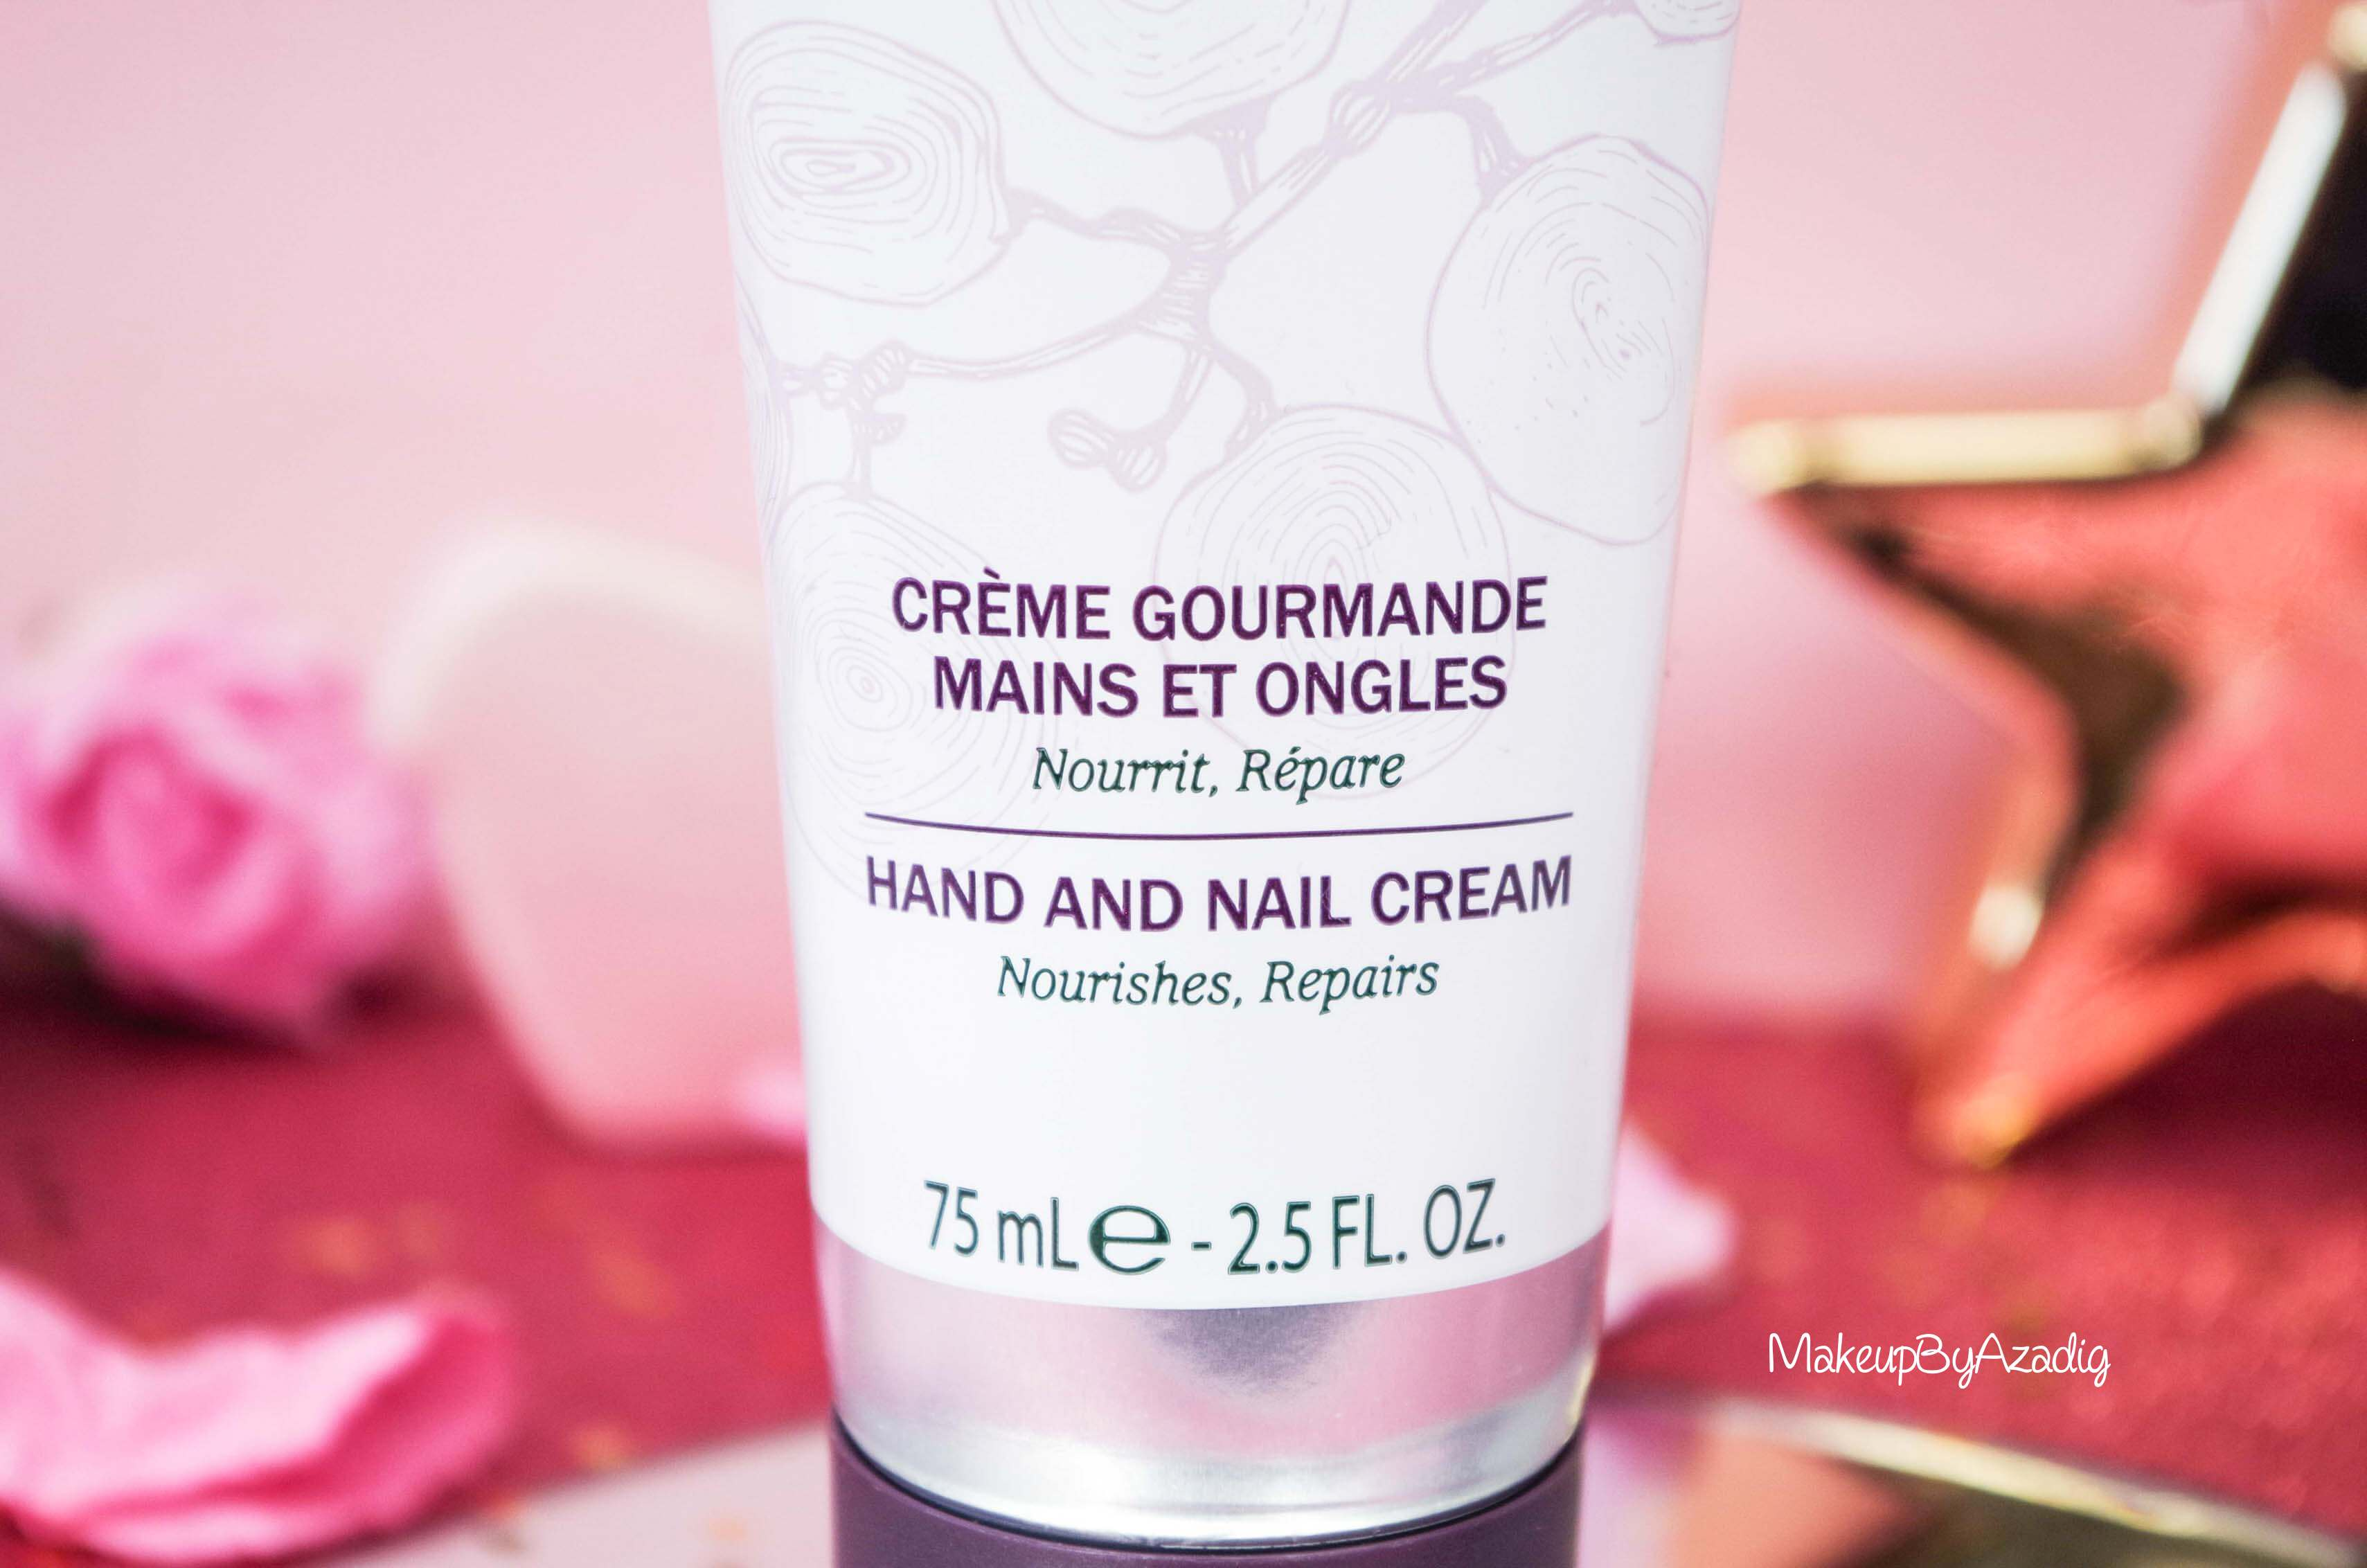 creme-gourmande-mains-ongles-caudalie-hydratante-paris-revue-review-avis-prix-efficacite-makeupbyazadig-nourrit